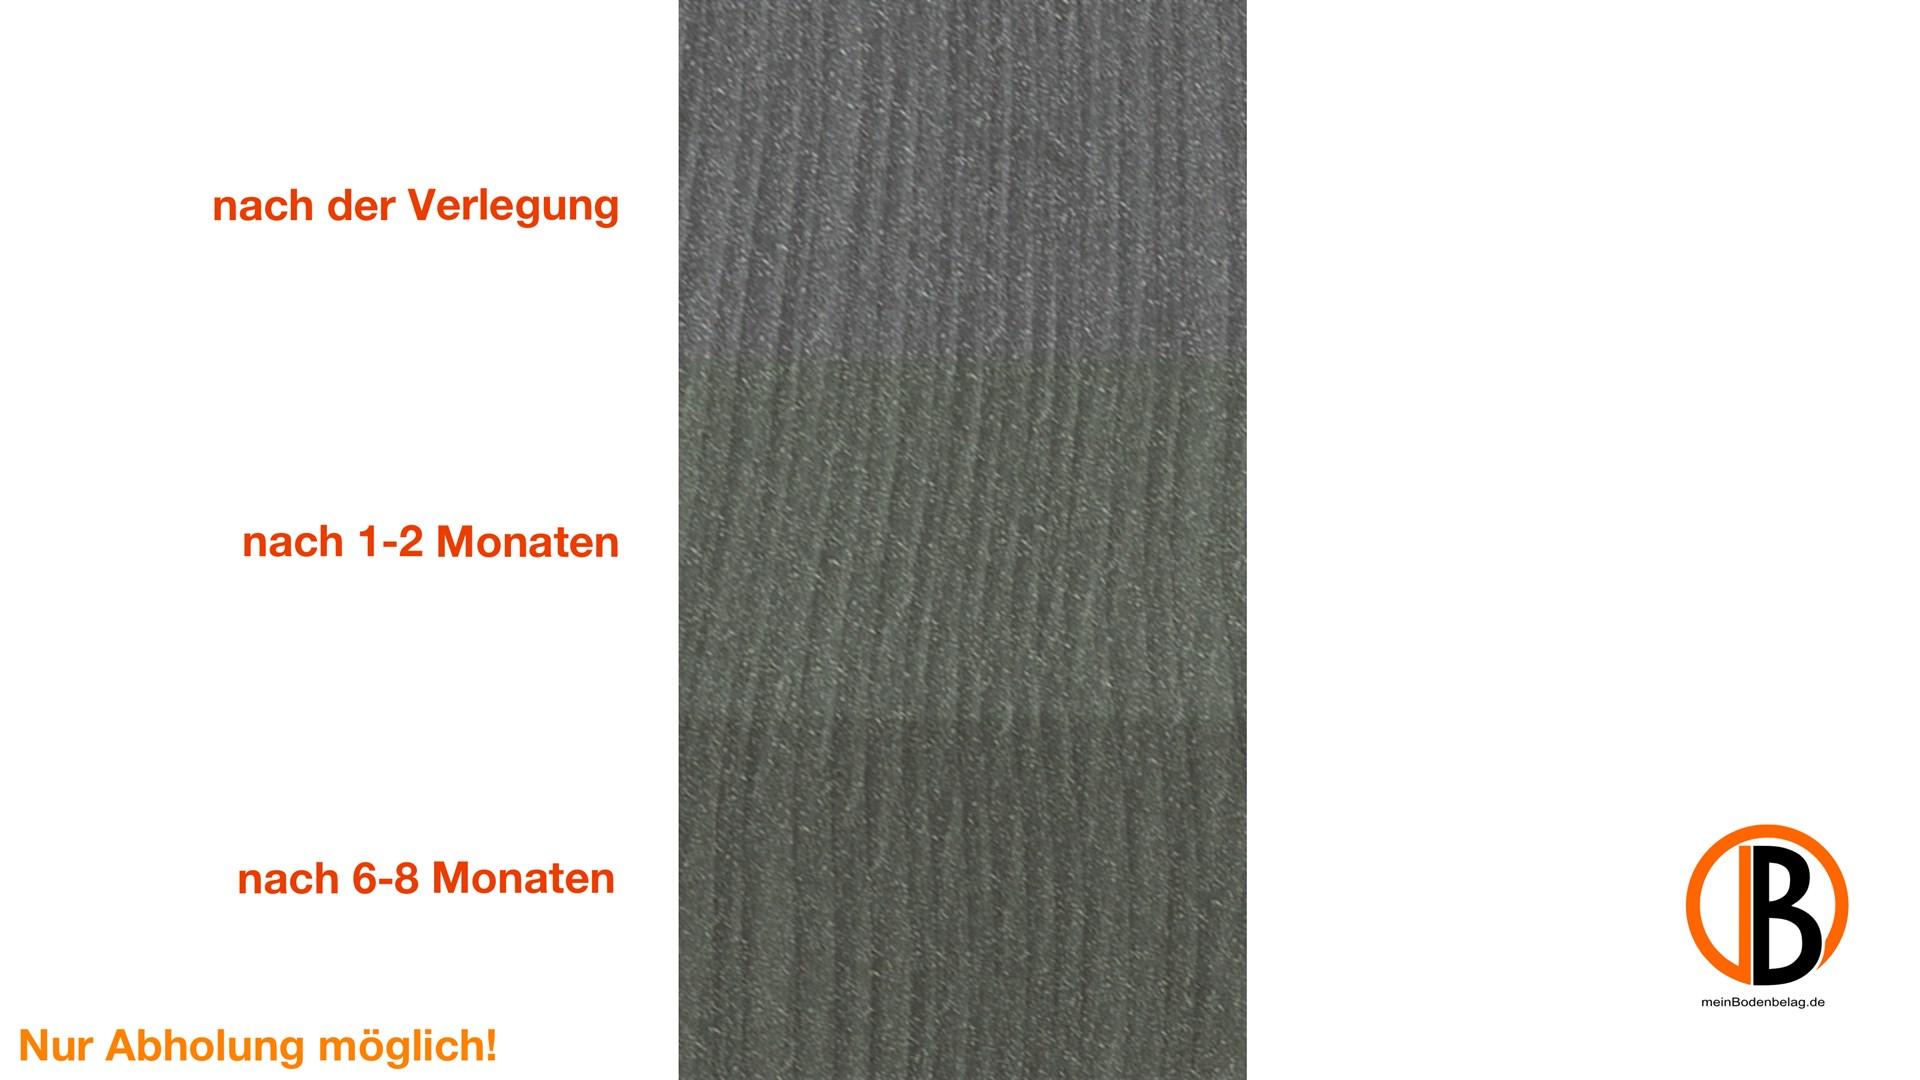 megawood premium plus schiefergrau 21x145x3600 barfu diele massiv. Black Bedroom Furniture Sets. Home Design Ideas